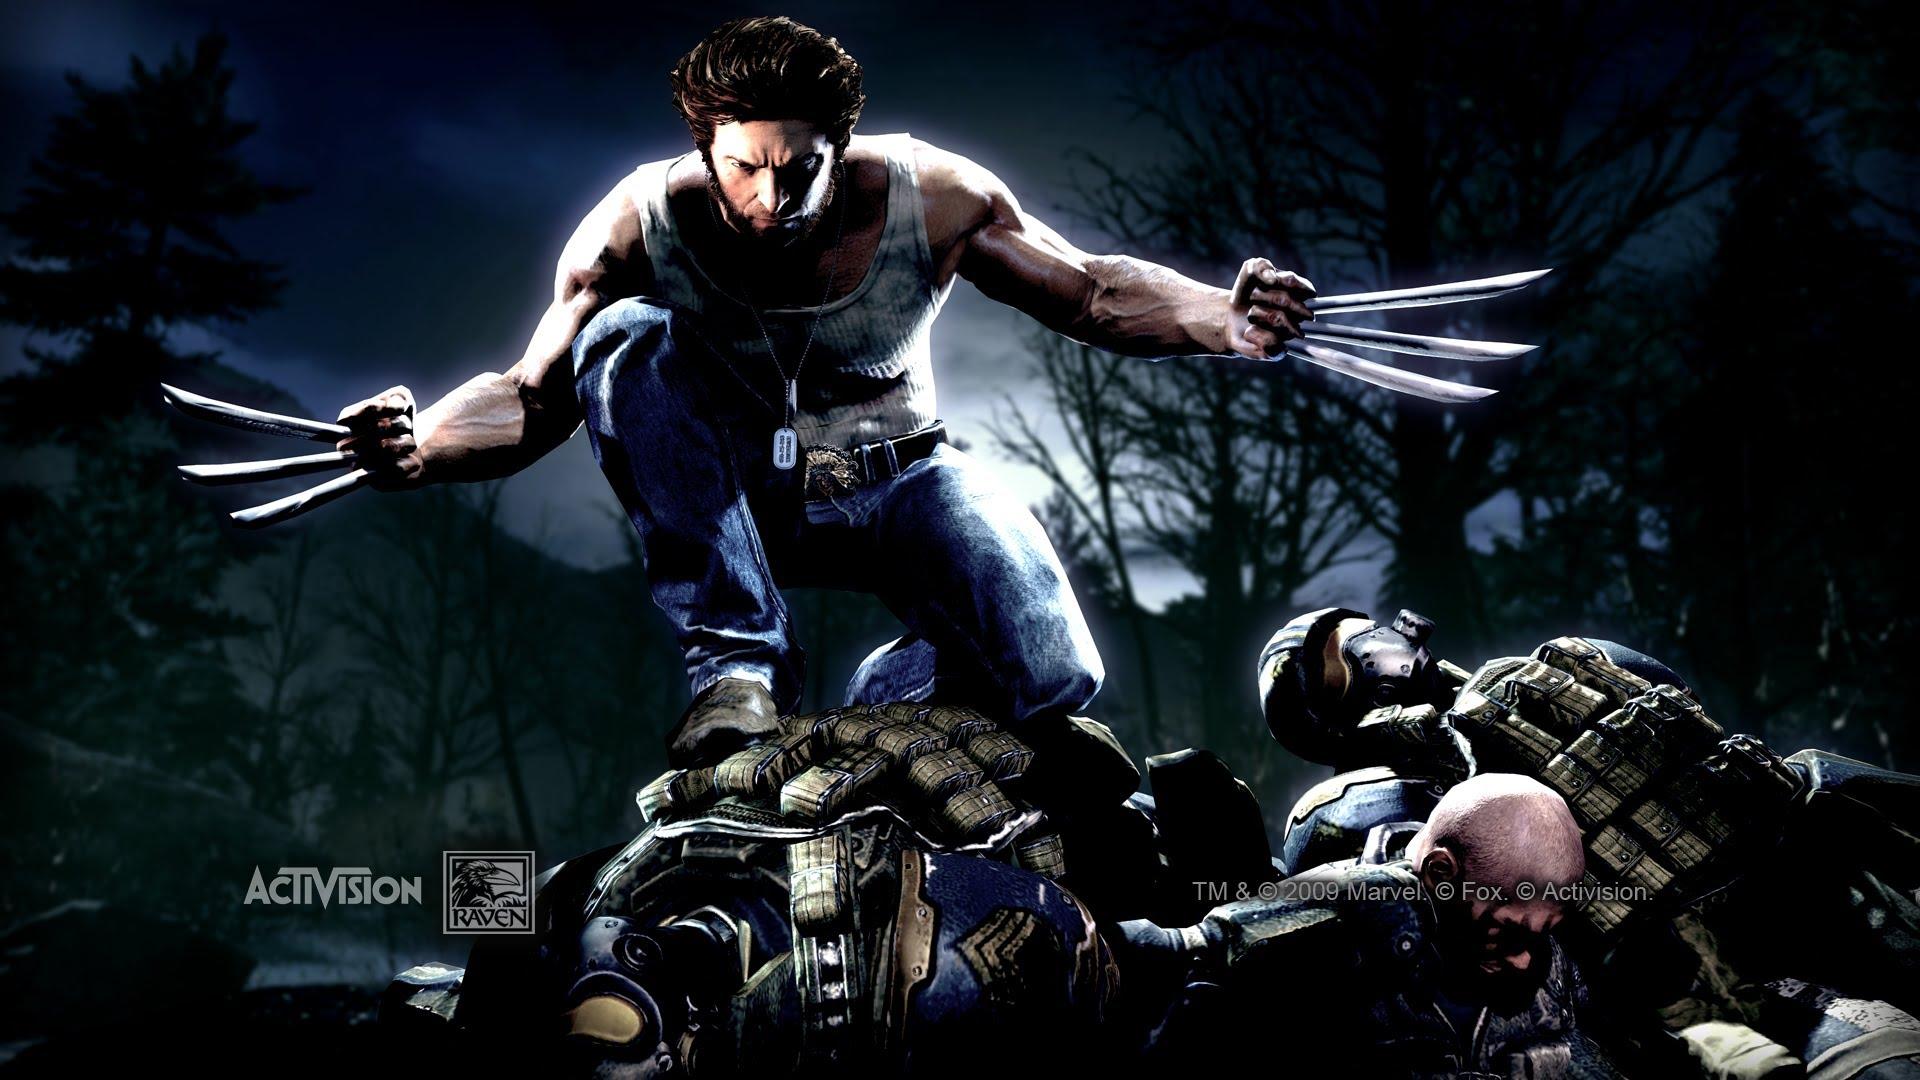 Wolverine Wallpaper Hd X Men Origins Wolverine 23180 Hd Wallpaper Backgrounds Download